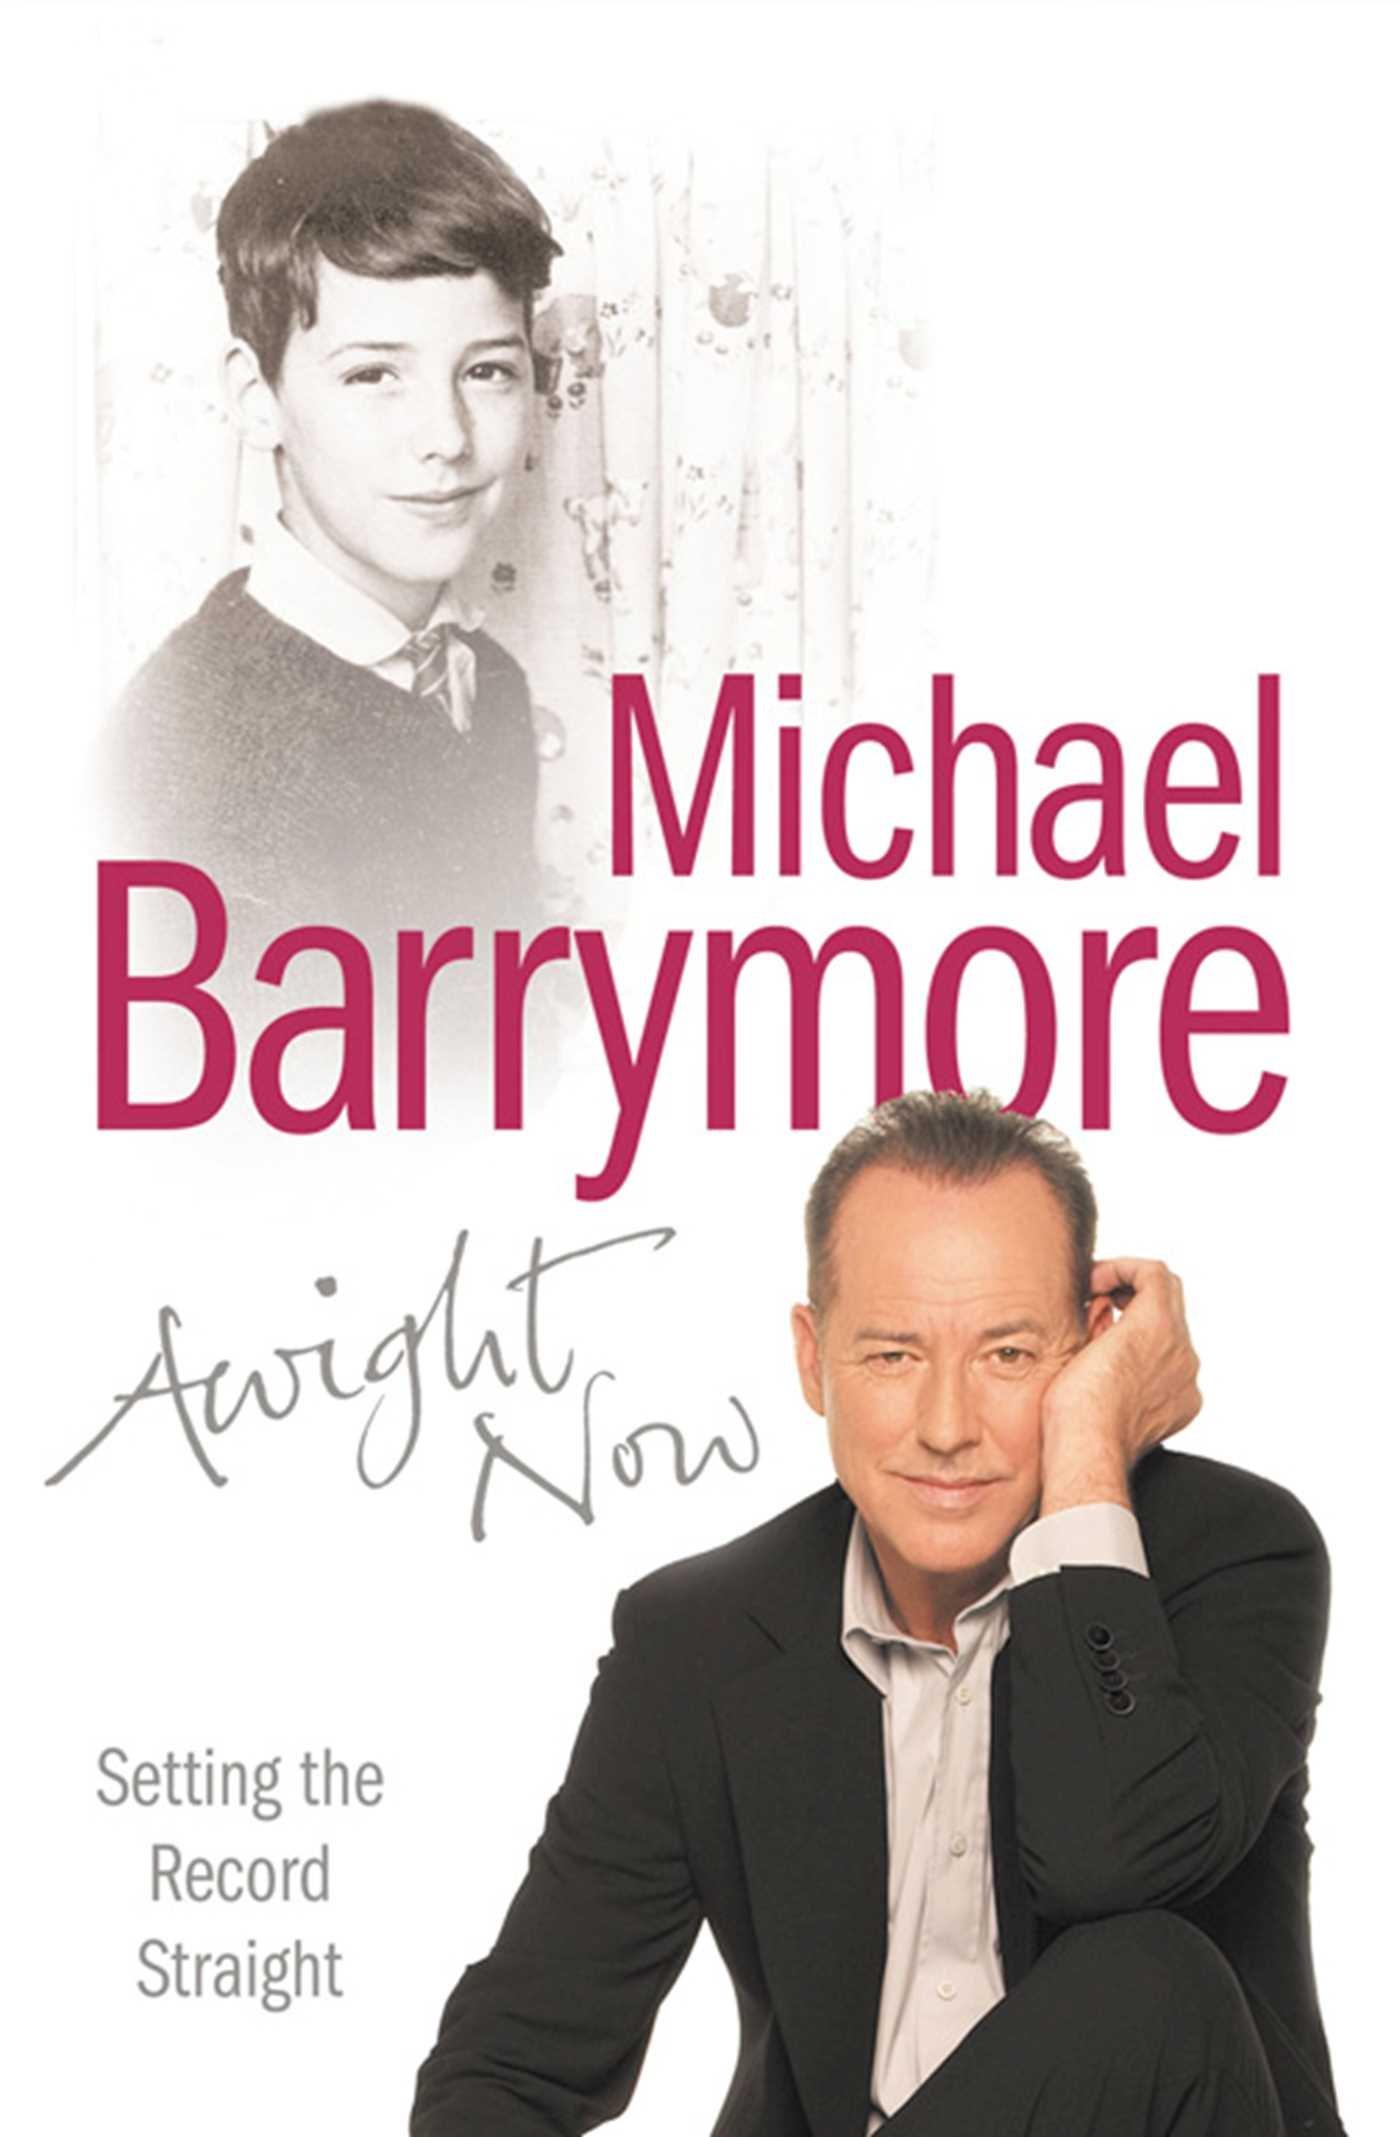 Michael Barrymore (born 1952) nude photos 2019